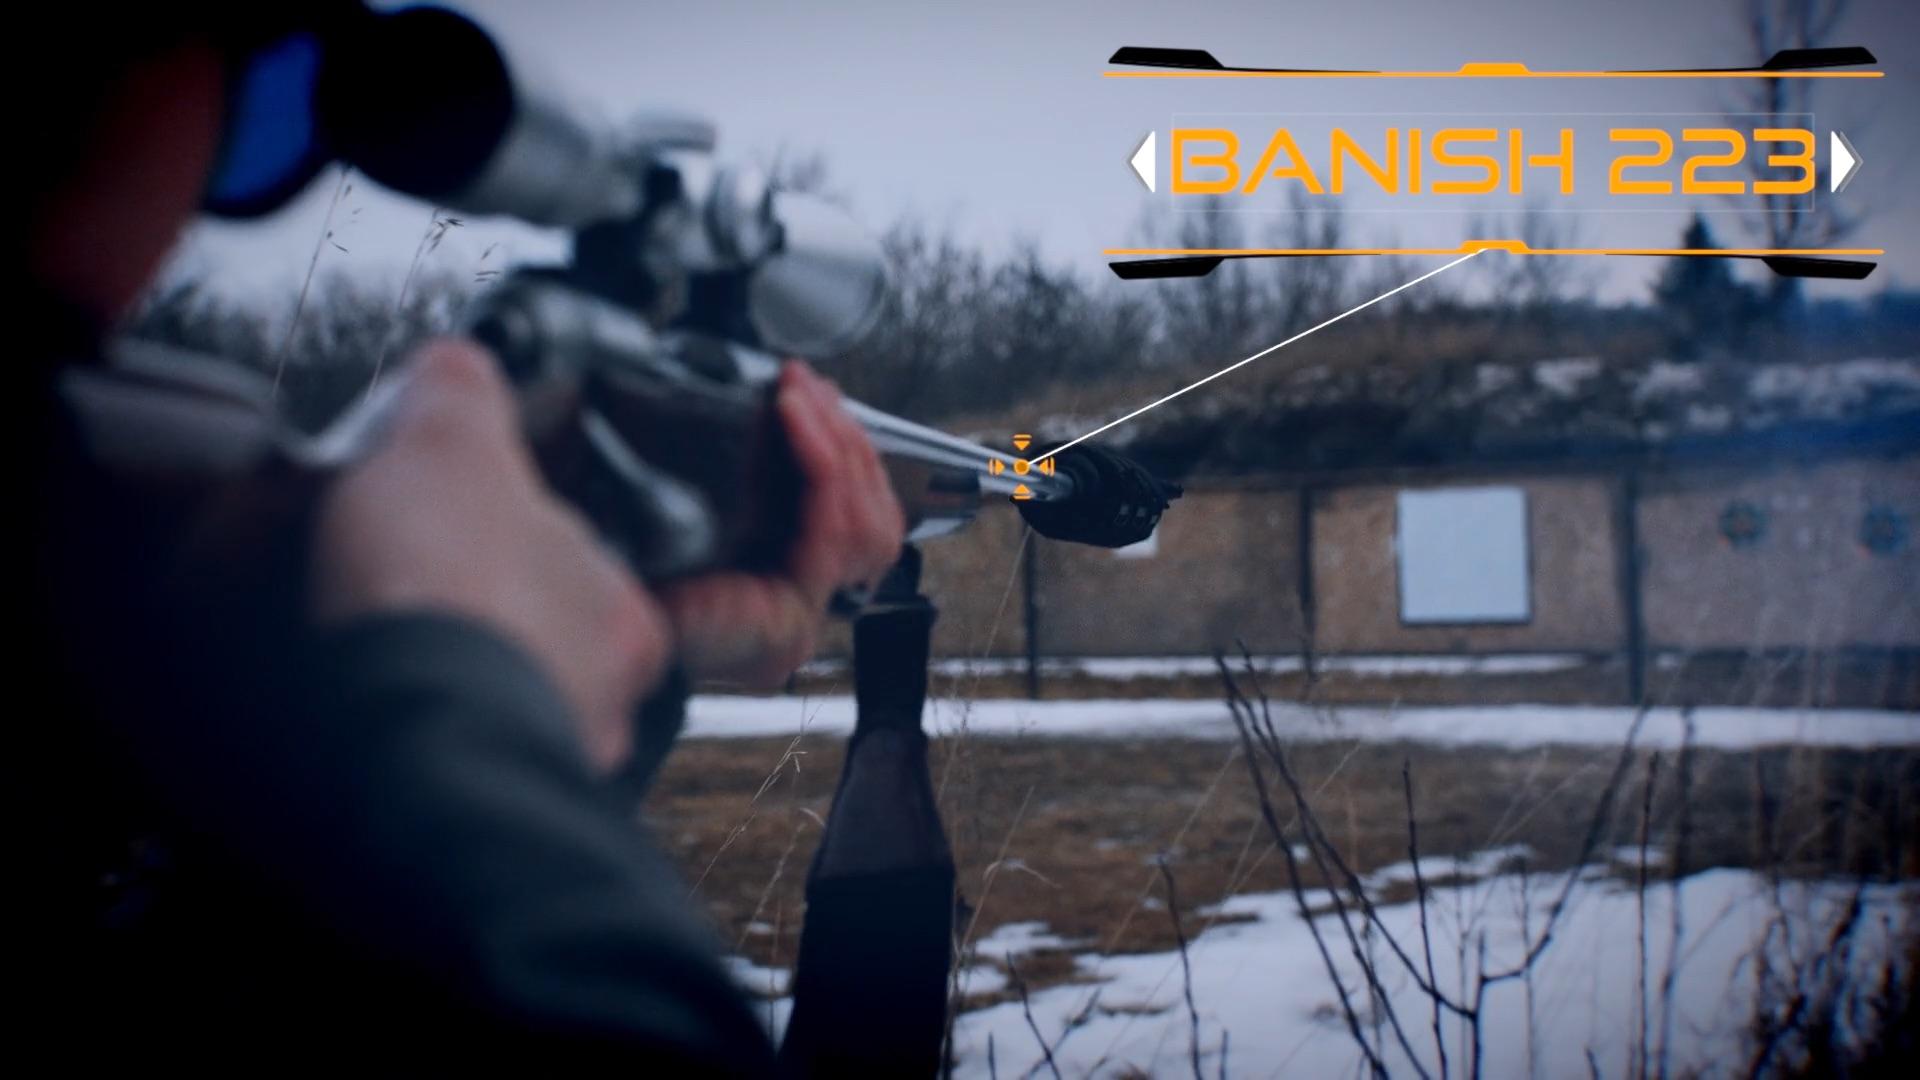 Banish 223 Suppressor